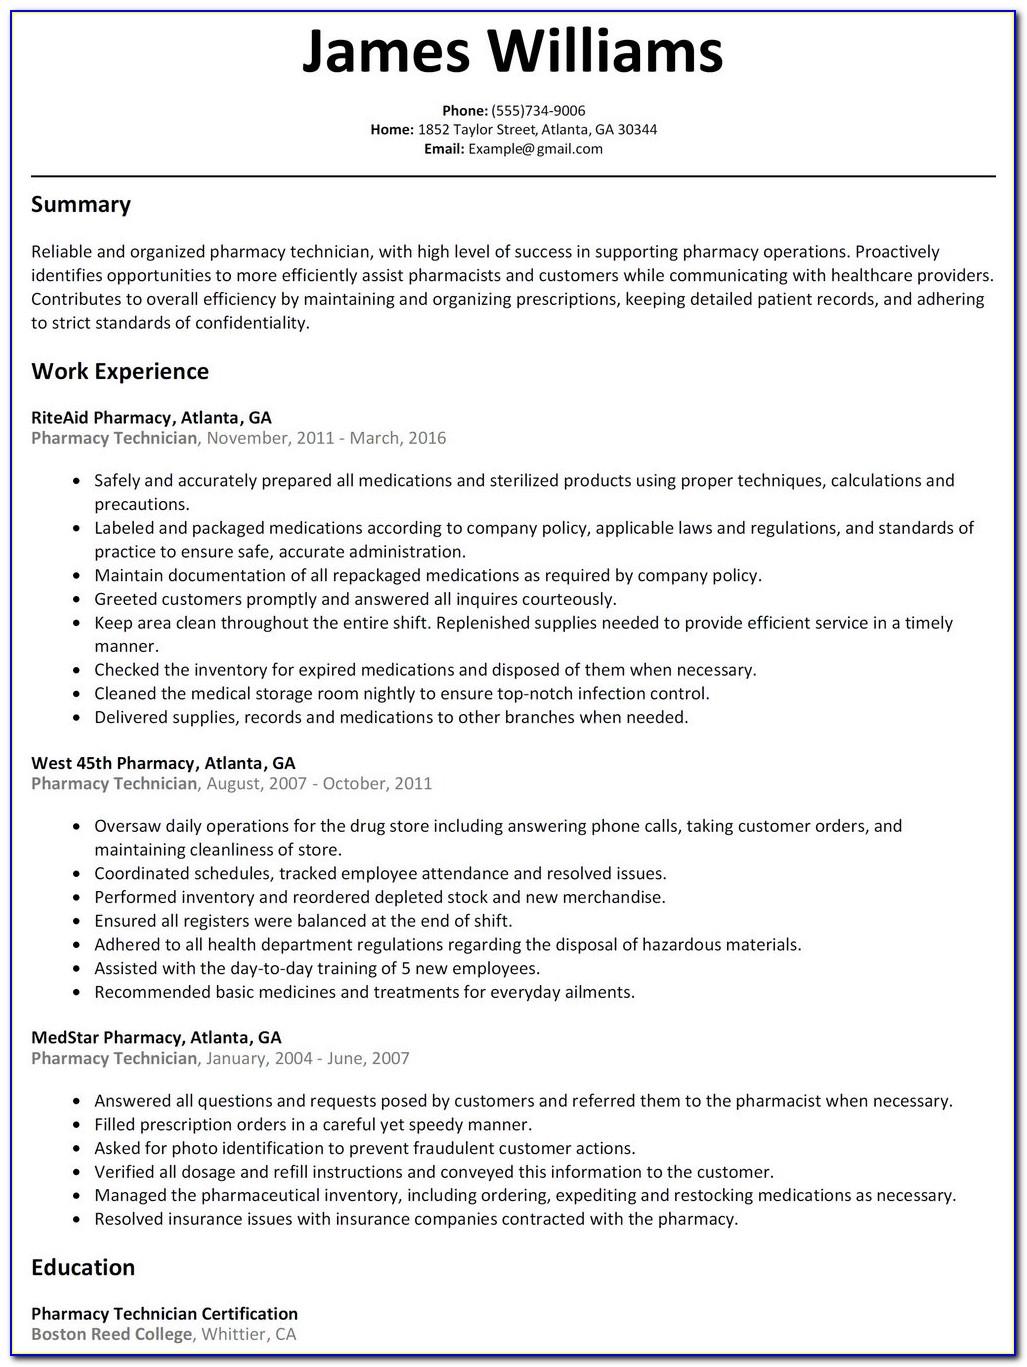 Cvs Pharmacy Technician Job Application - Job Applications ...